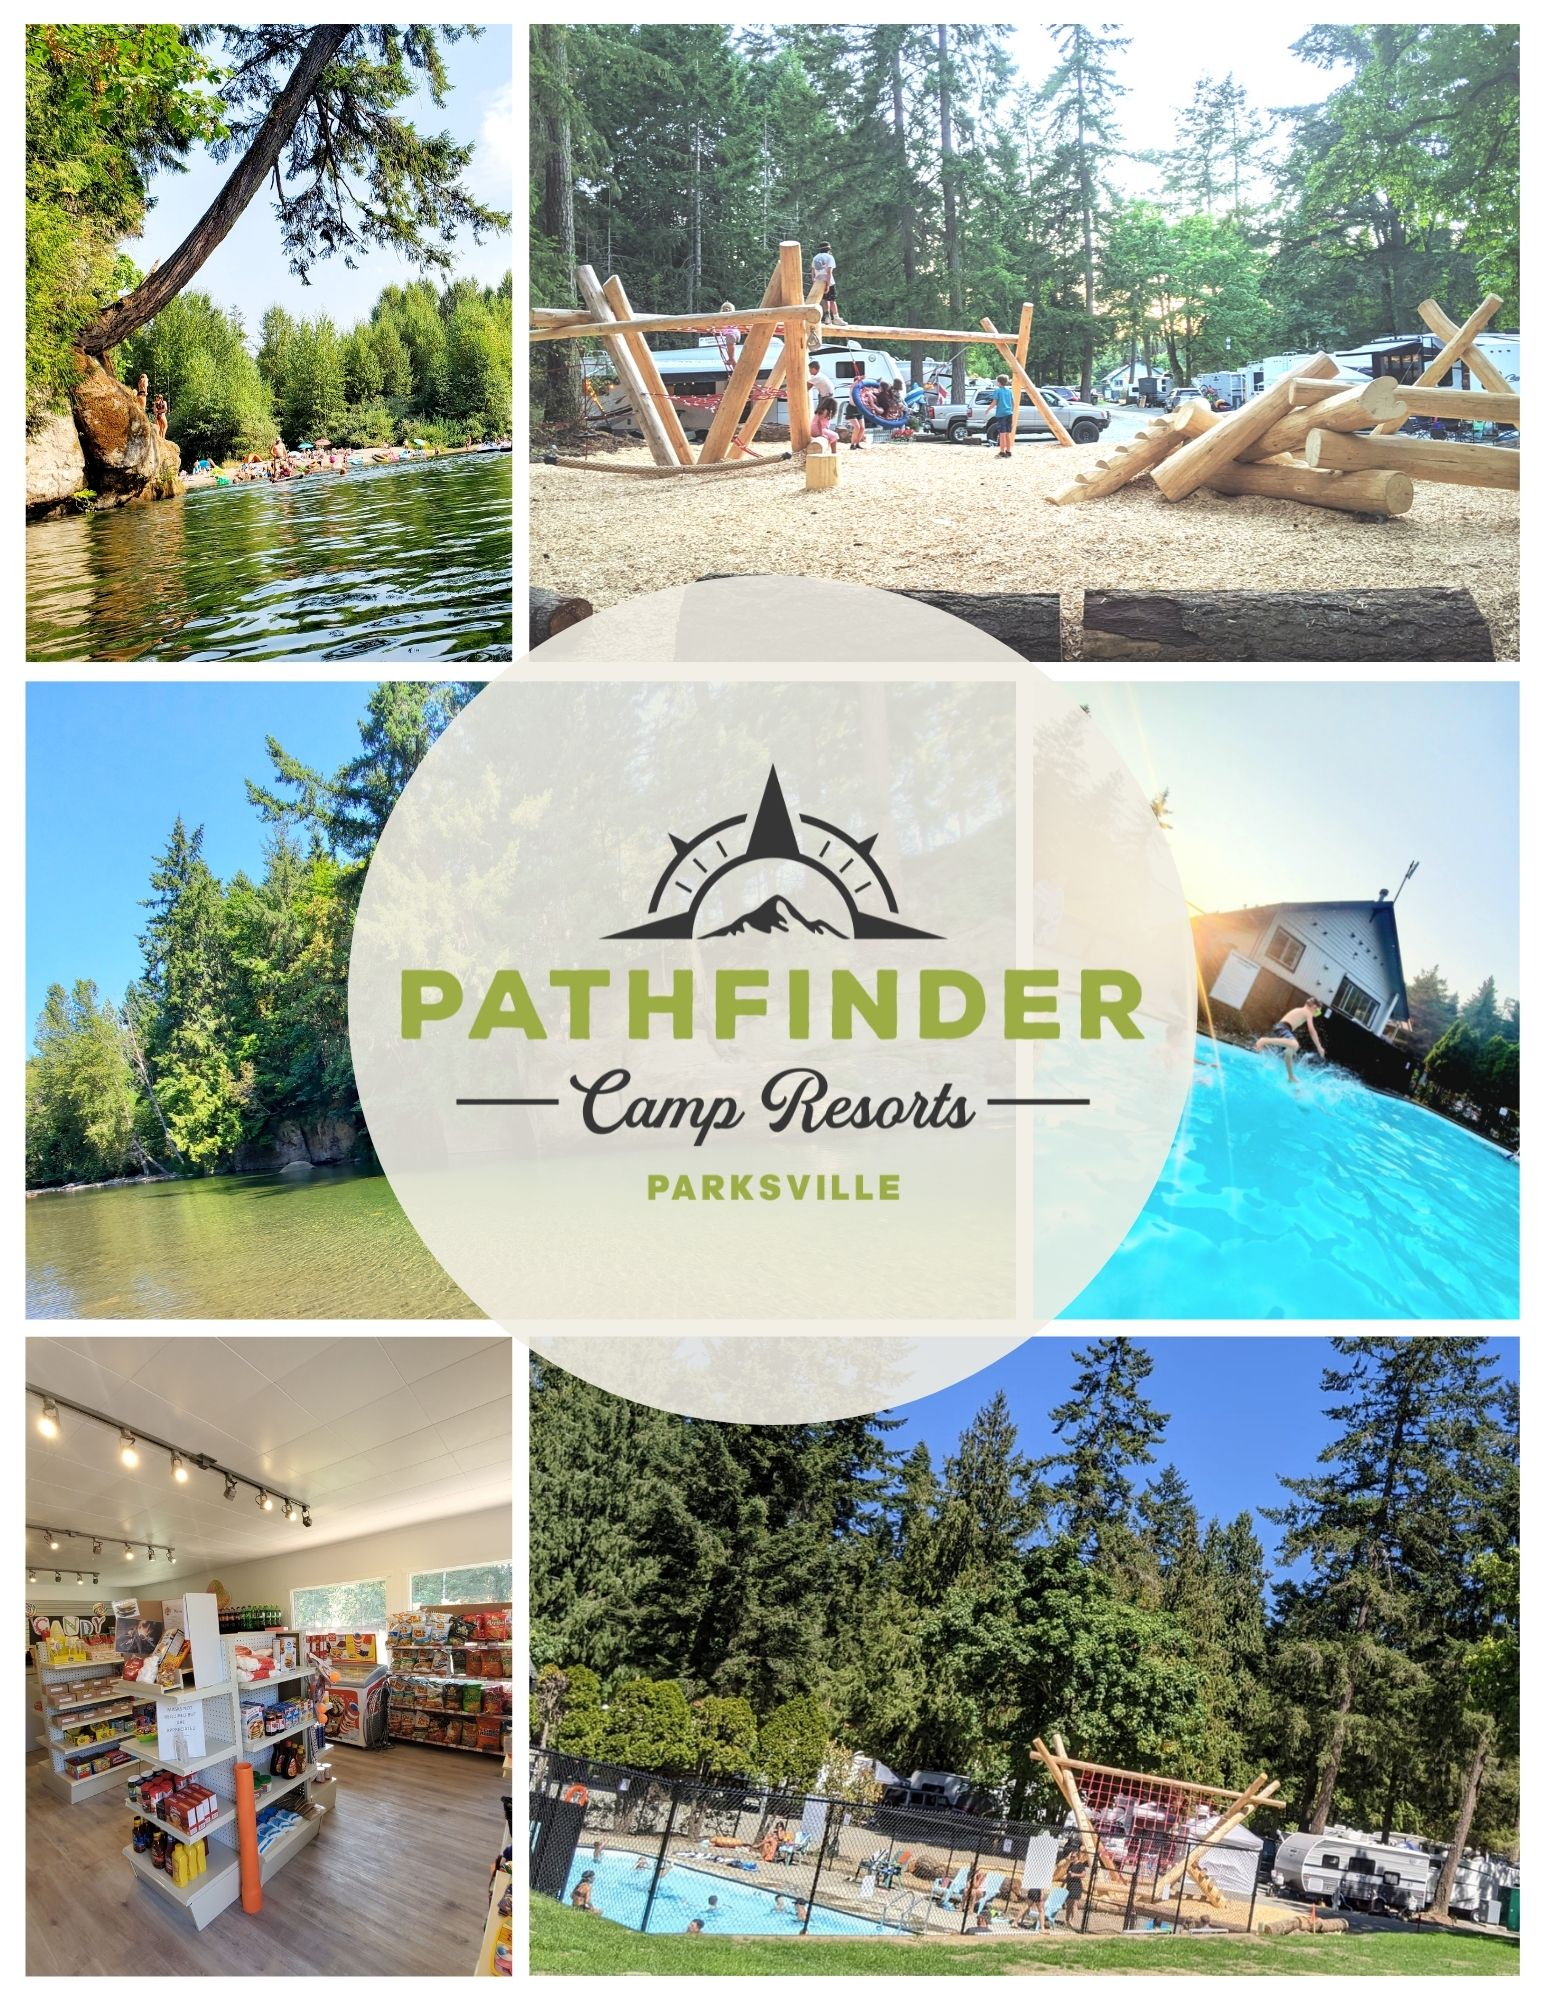 parrys rv park parksville camp camping campground camp resort pathfinder